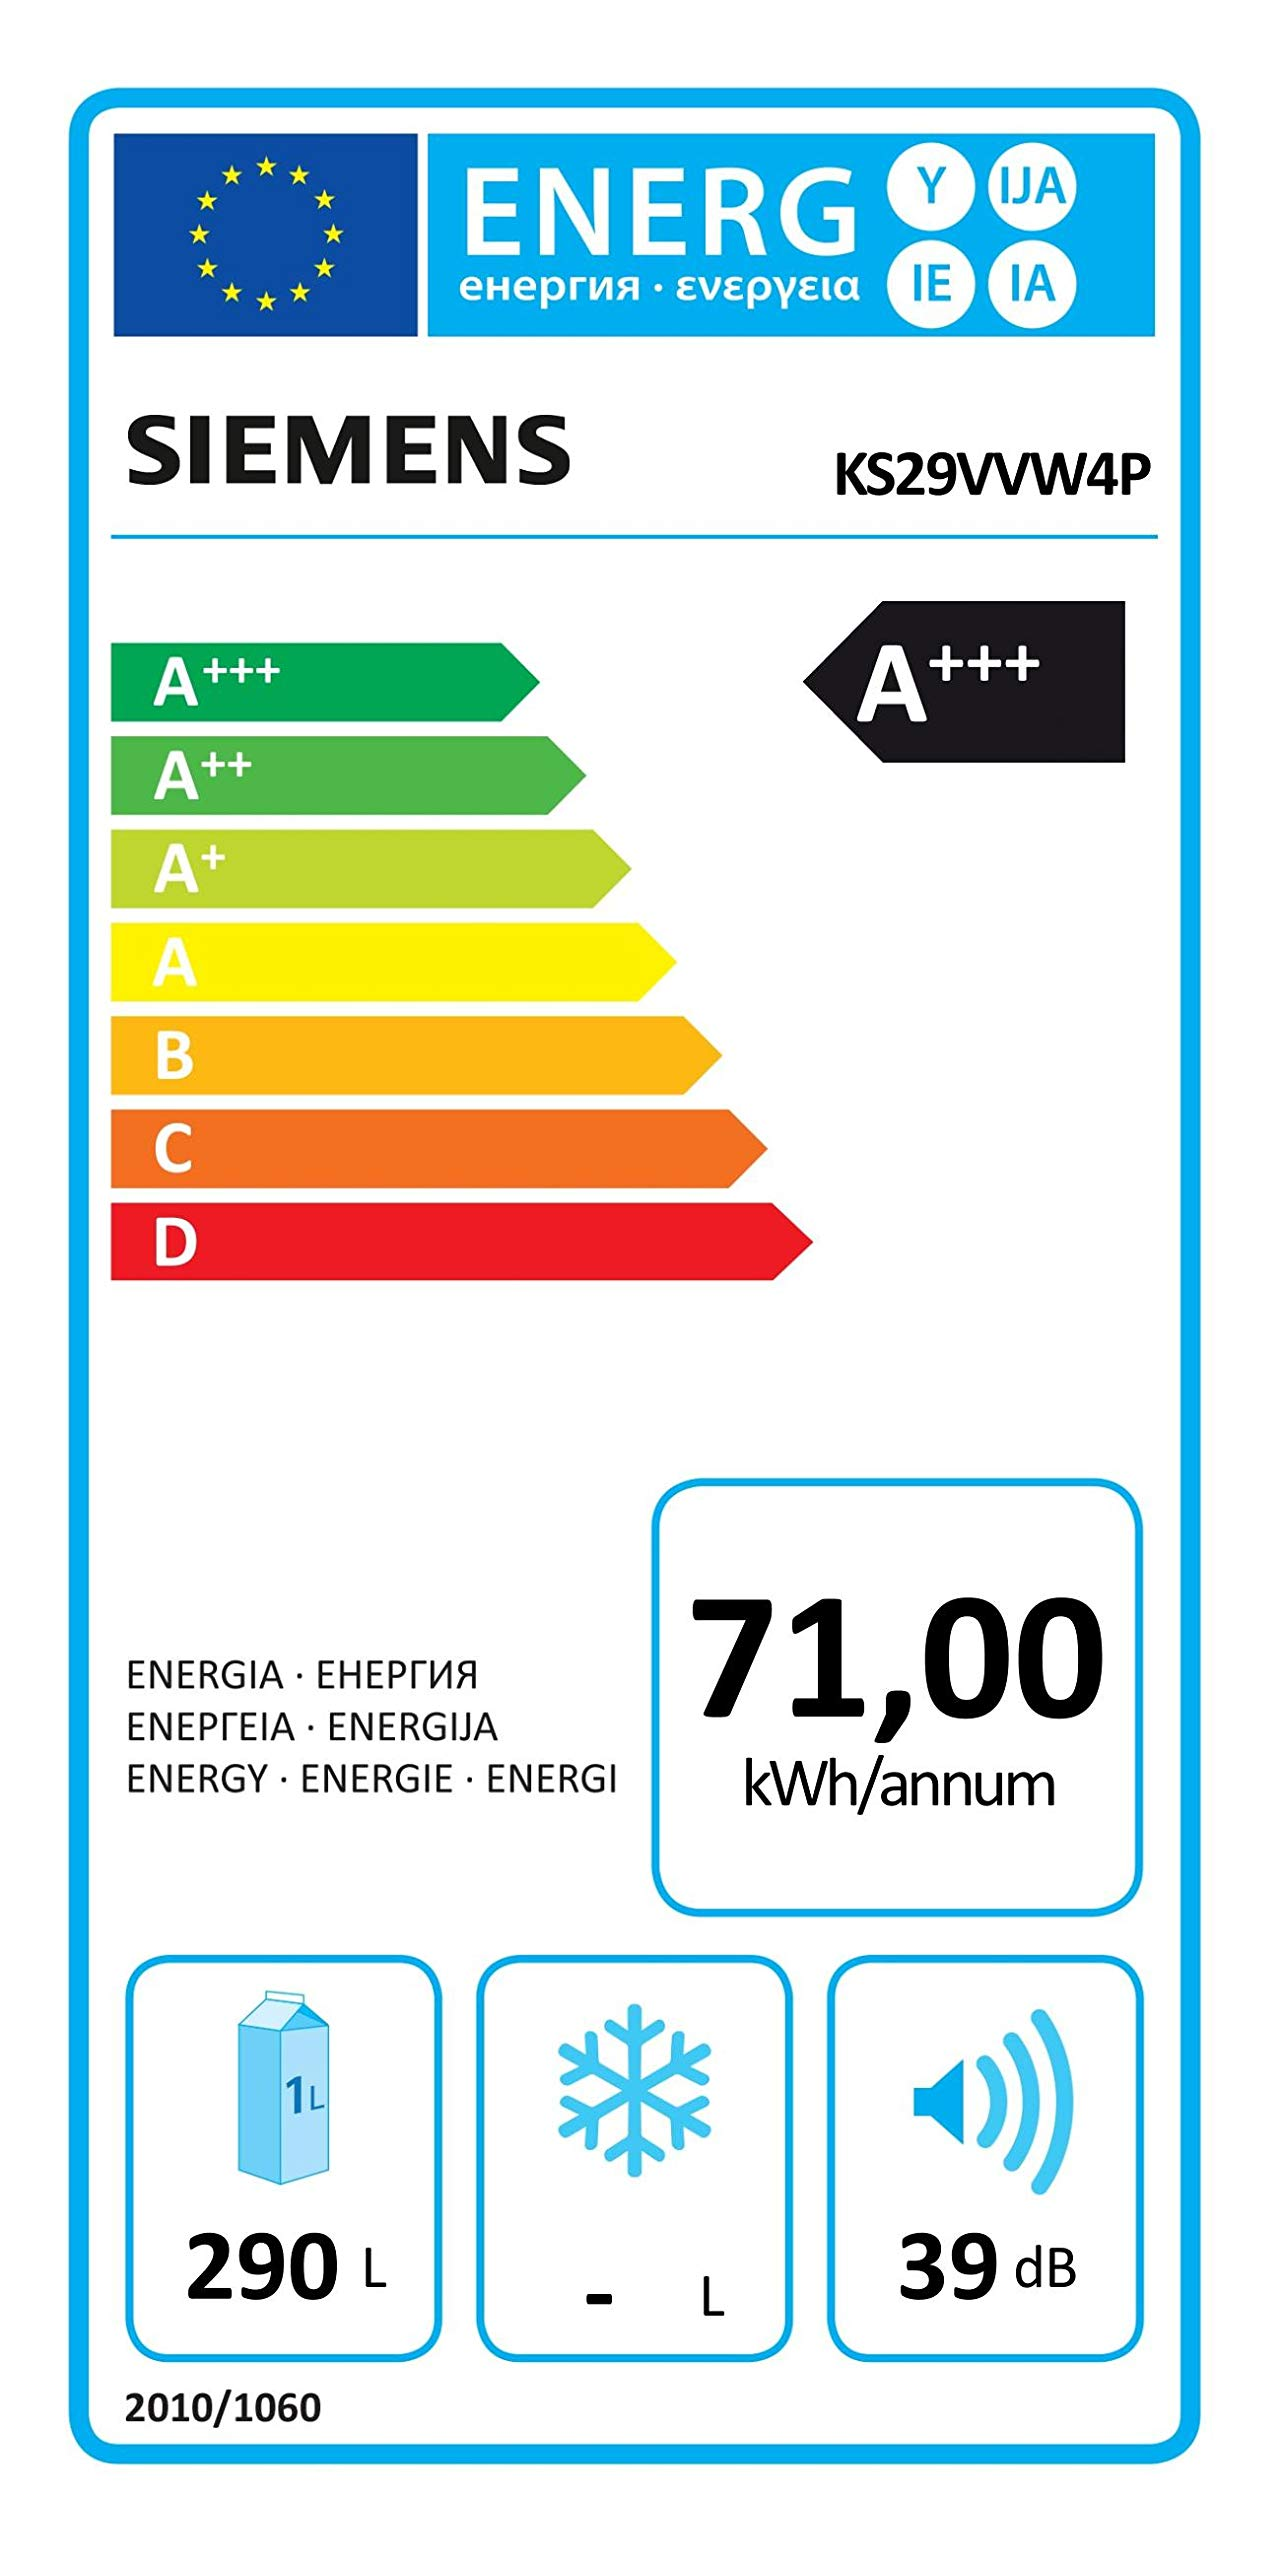 Siemens KS29VVW4P Kühlschrank / A+++ / 161 cm / 71 kWh/Jahr / 292 L Kühlteil / Supercooling